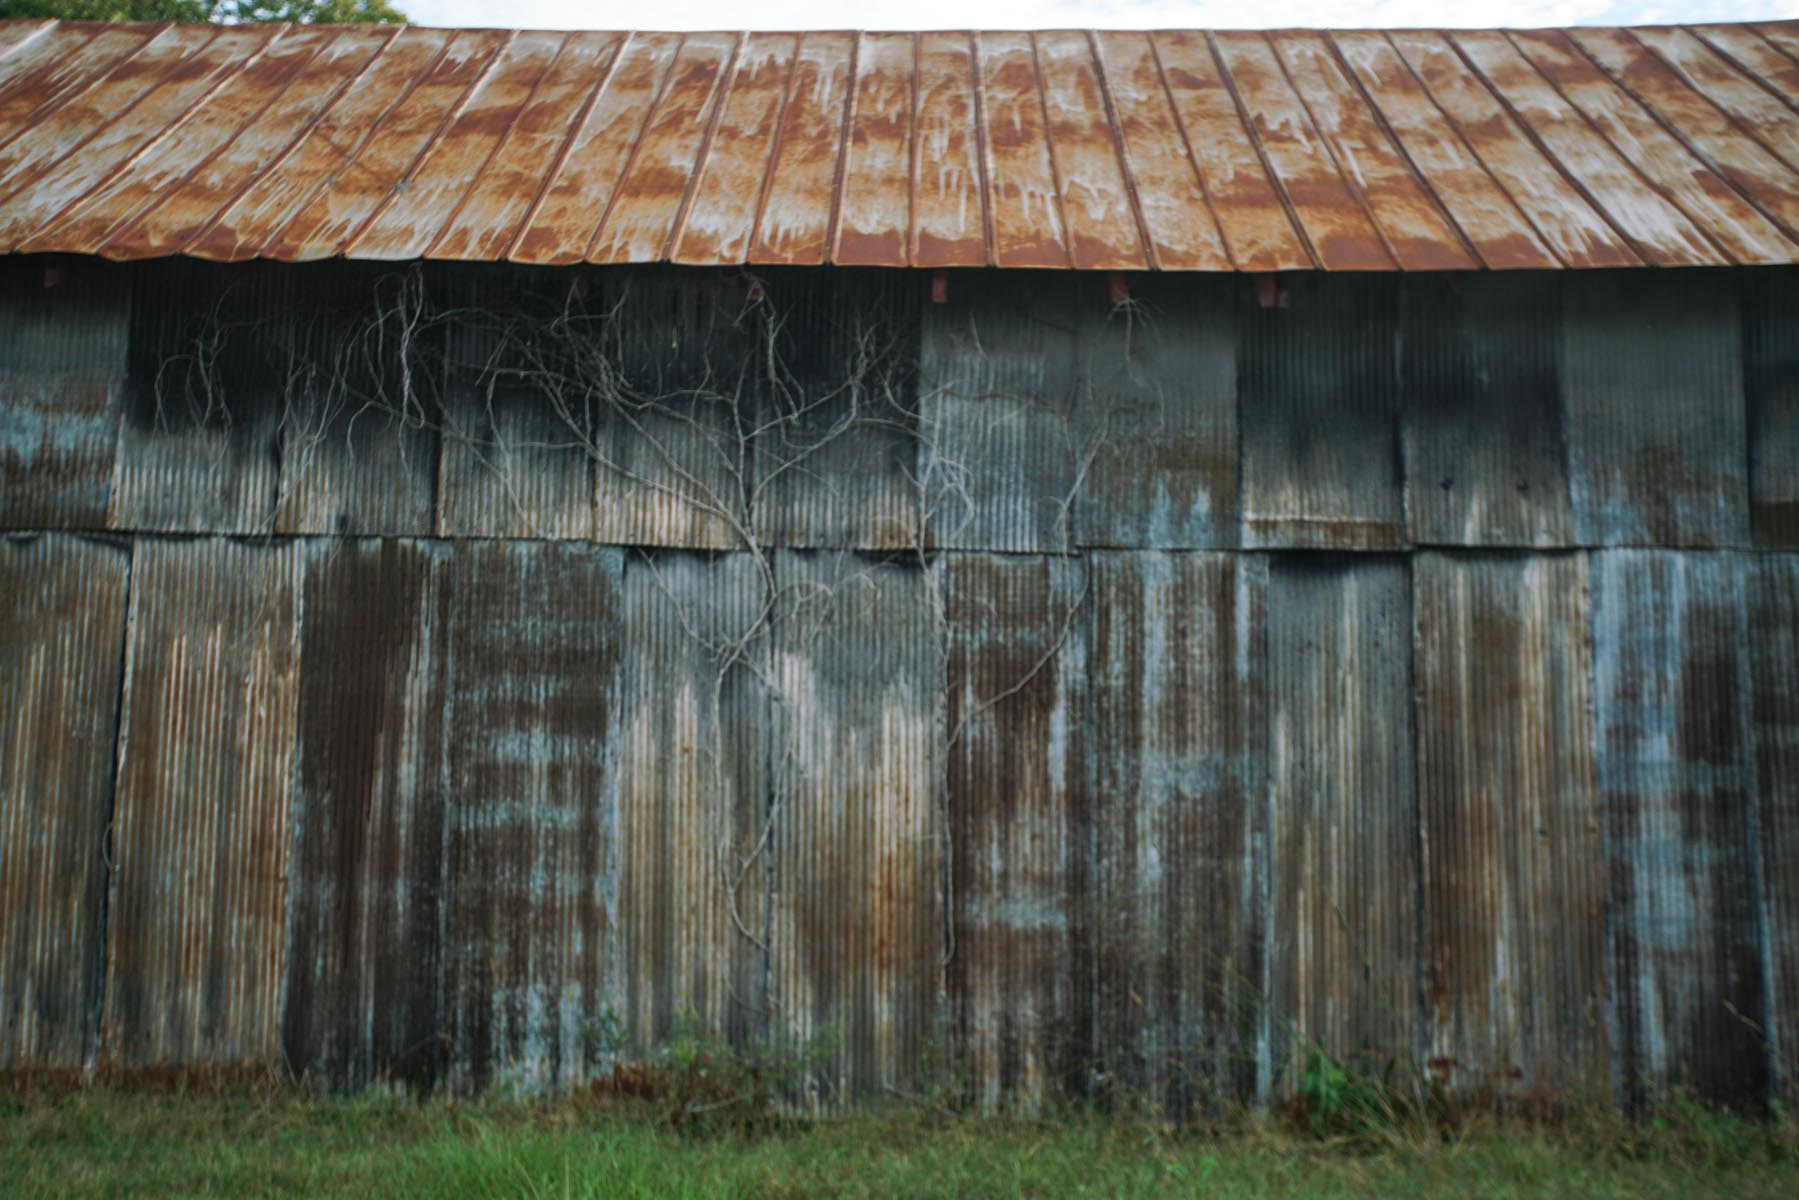 RA_hale county vernacular-07079.jpg